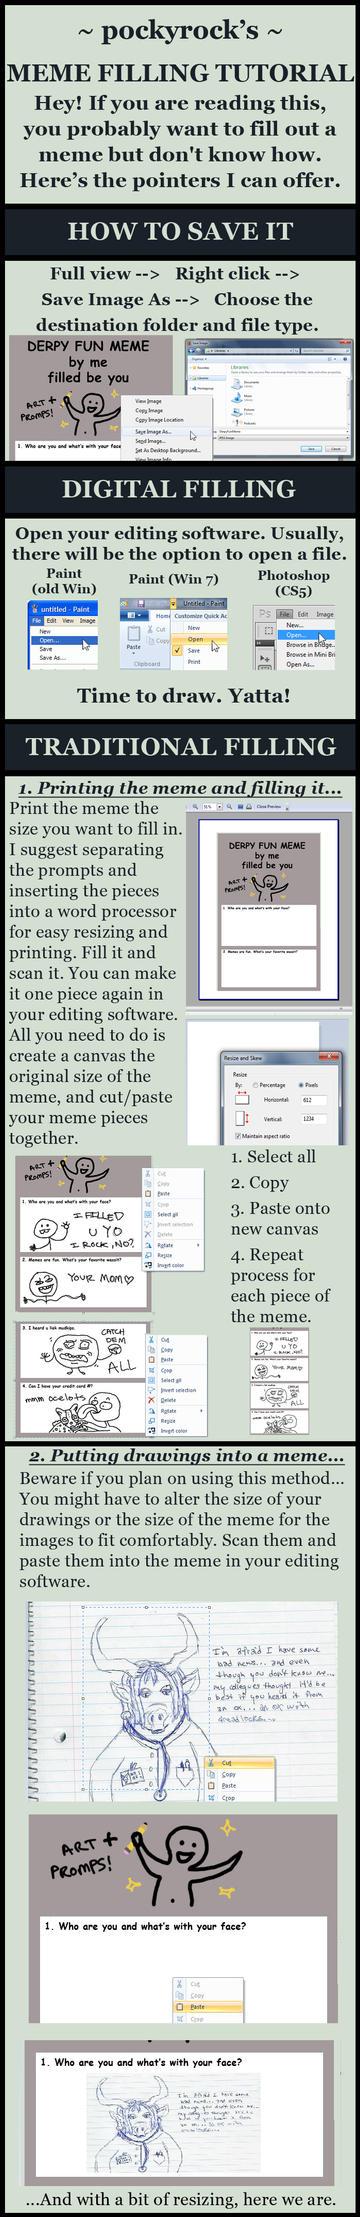 How to fill a meme (Tutorial) by pockyrock